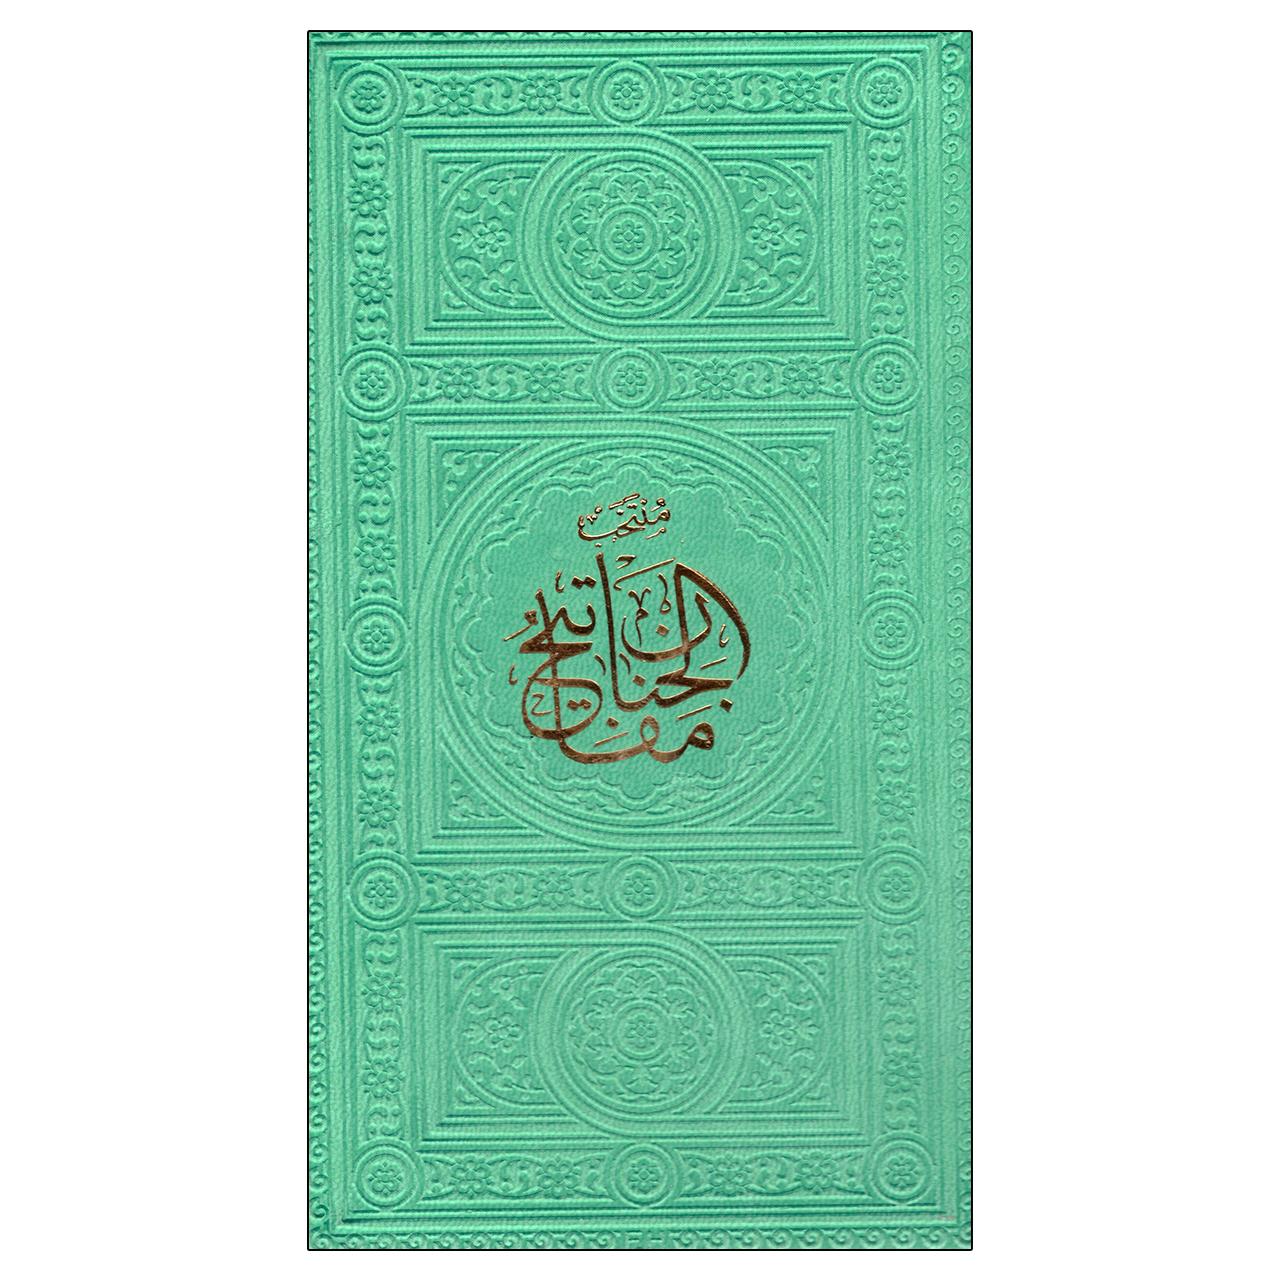 کتاب مفاتیح الجنان اثر شیخ عباس قمی انتشارات پیام عدالت